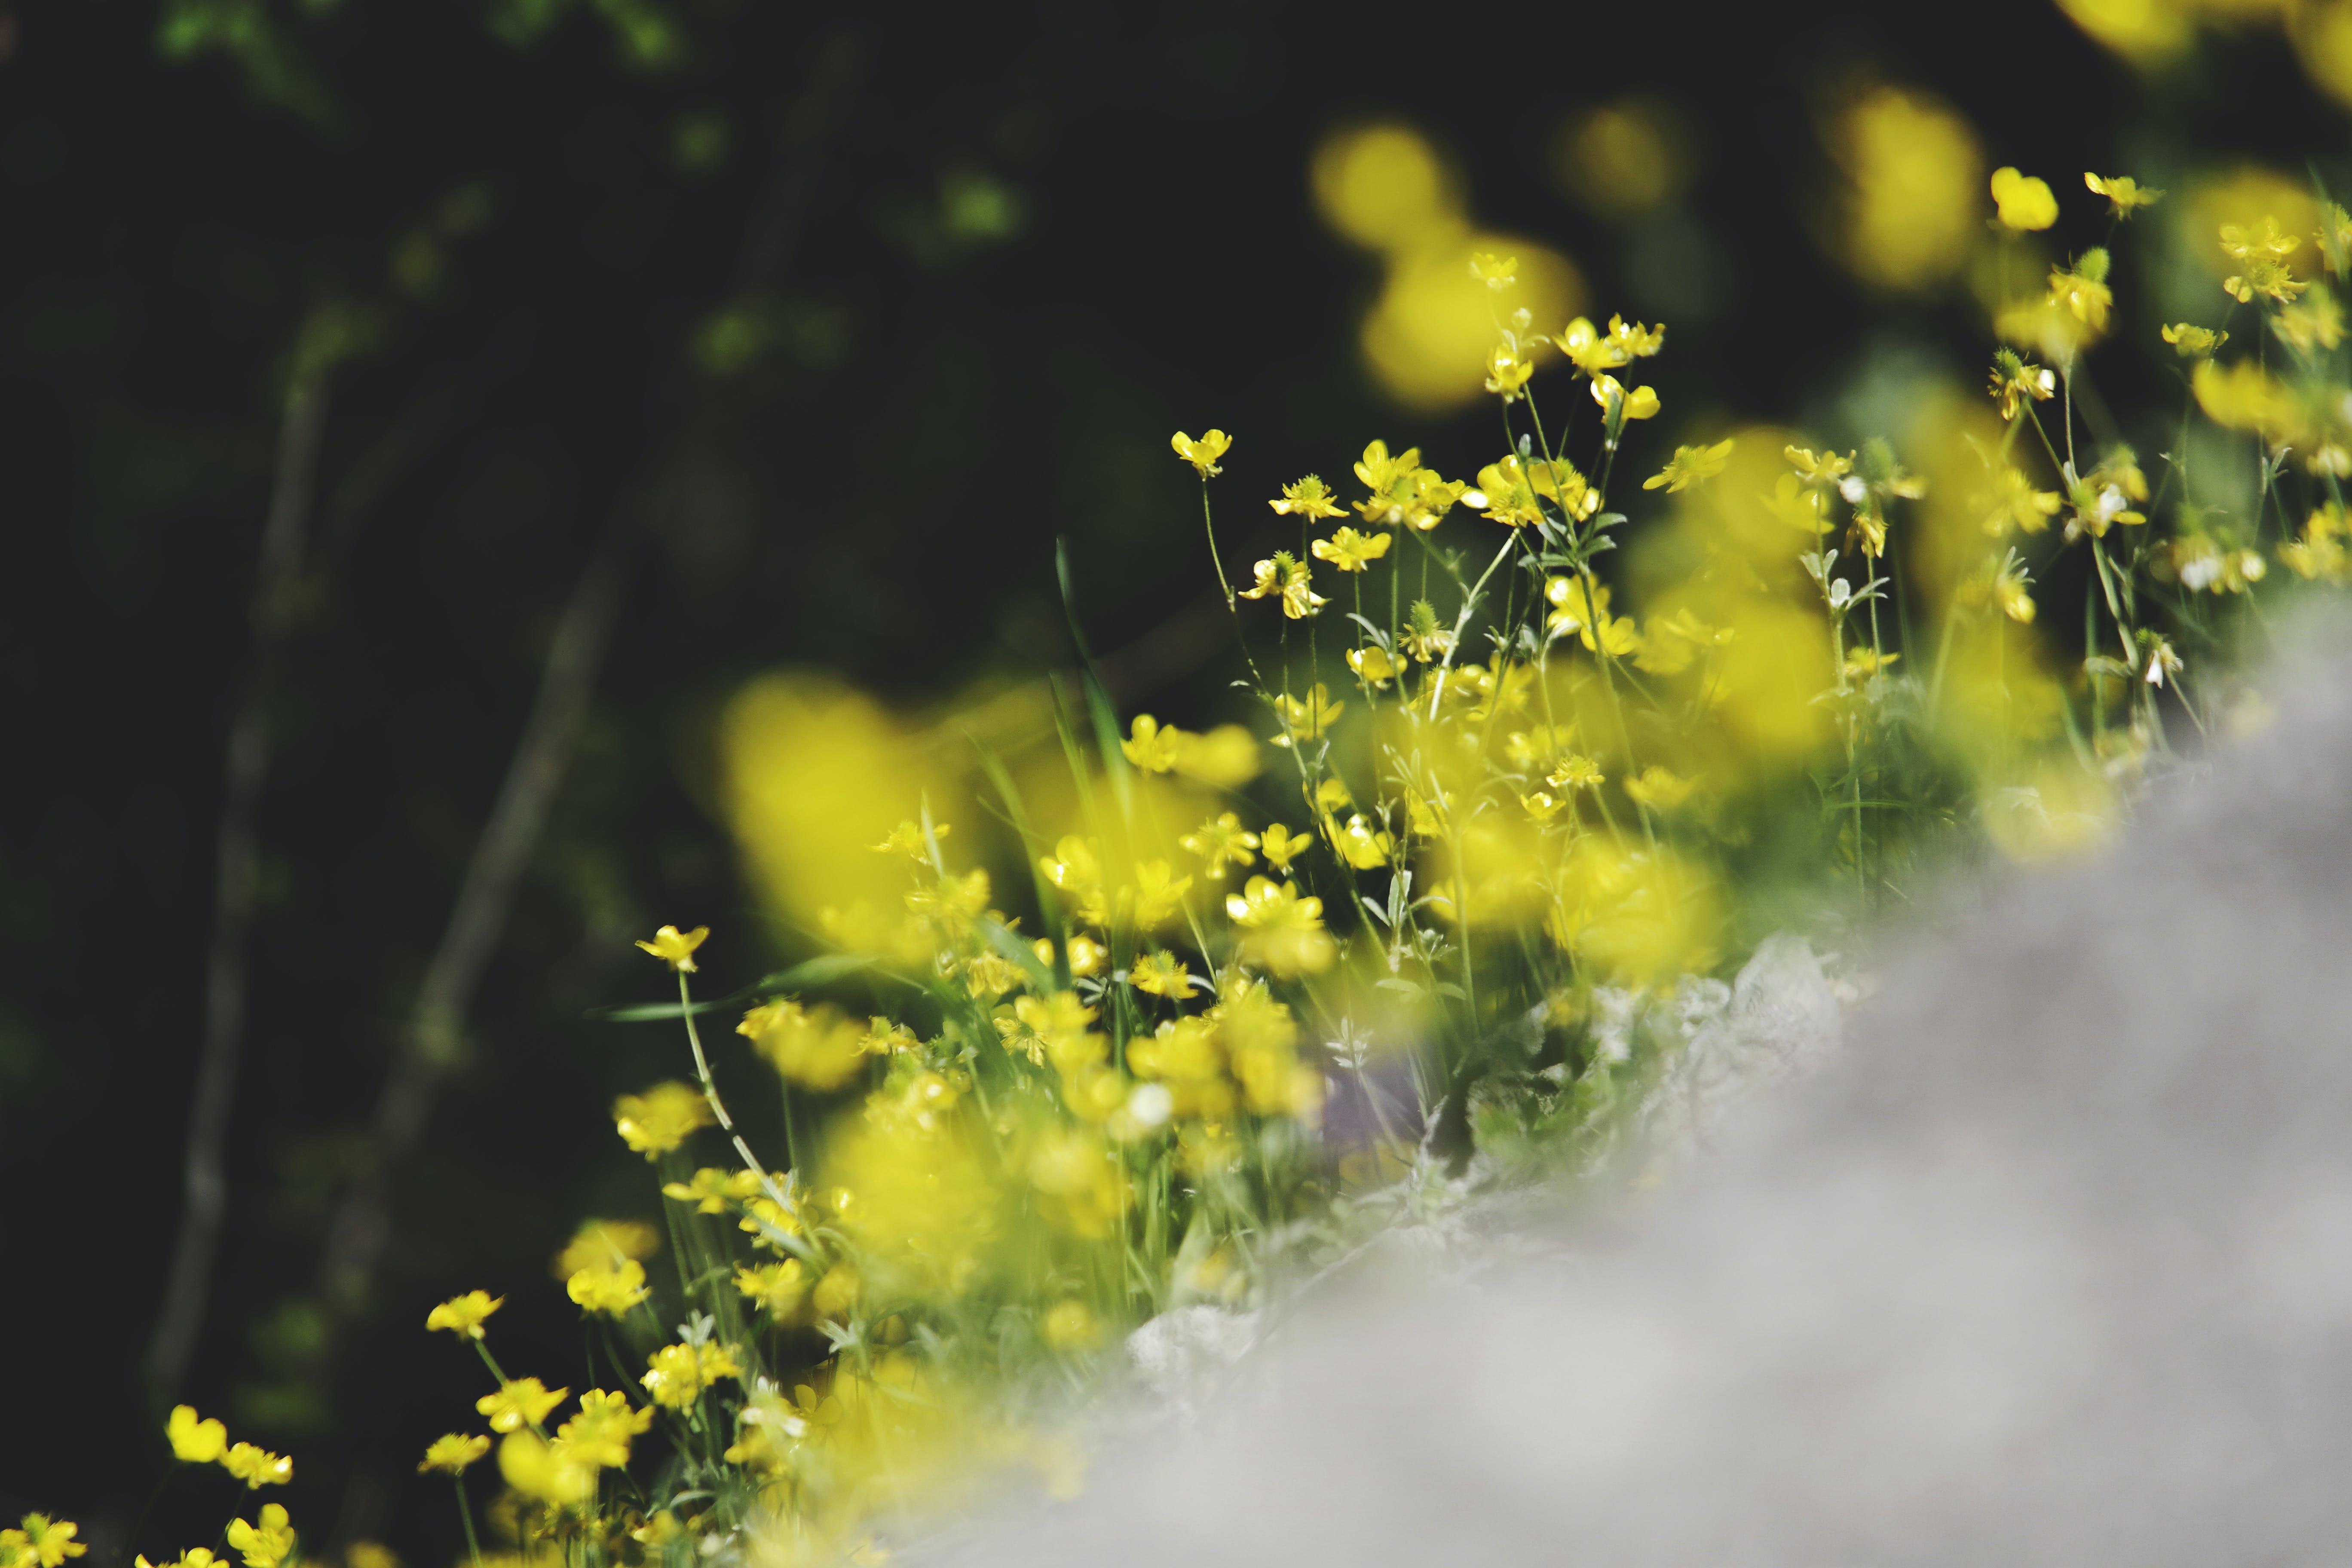 Yellow Flowers in Tilt Shift Lens Photography